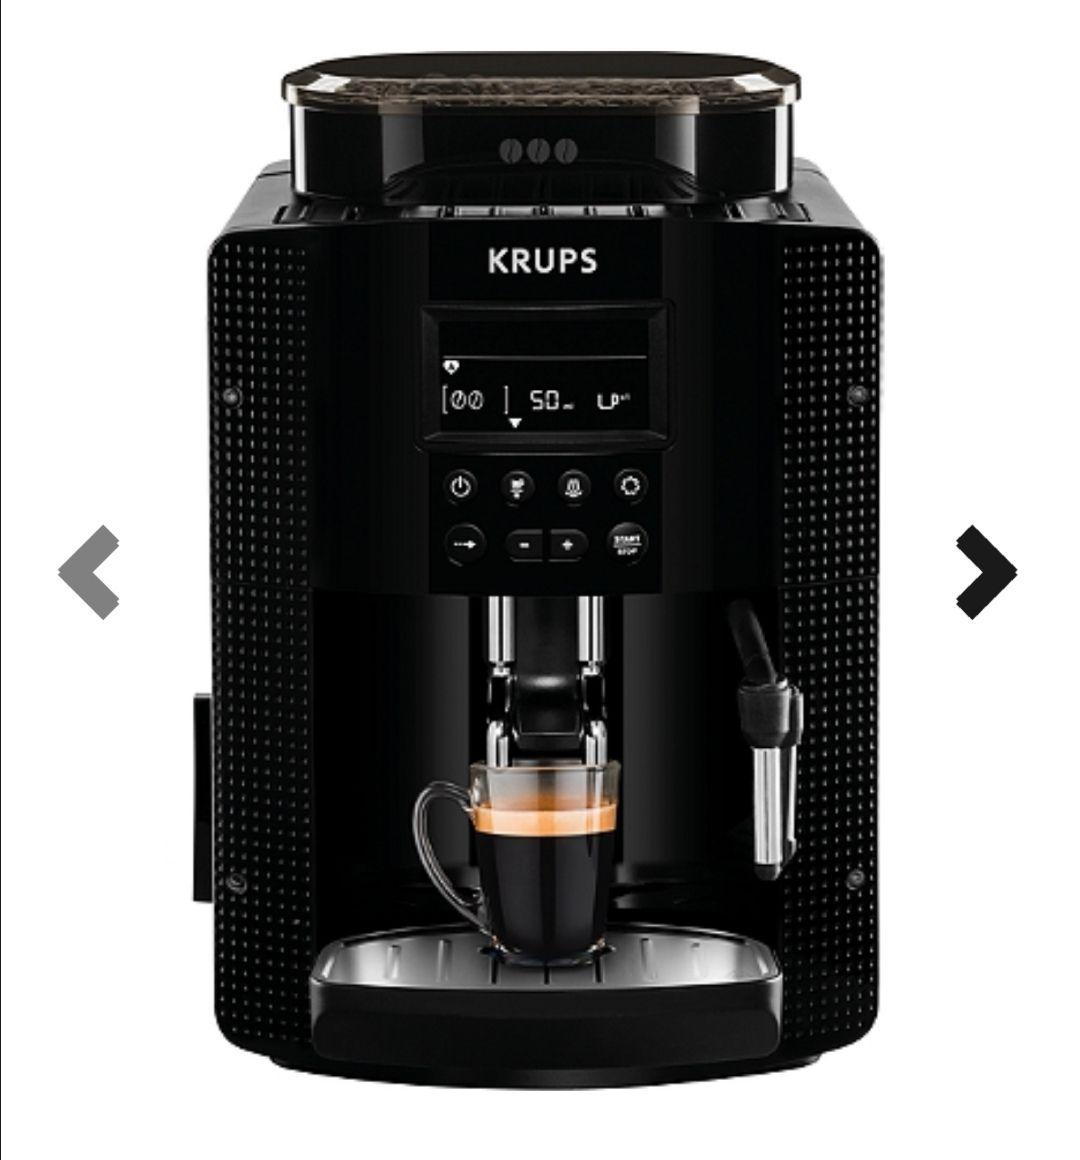 machine expresso krups yy4136fd avec broyeur. Black Bedroom Furniture Sets. Home Design Ideas